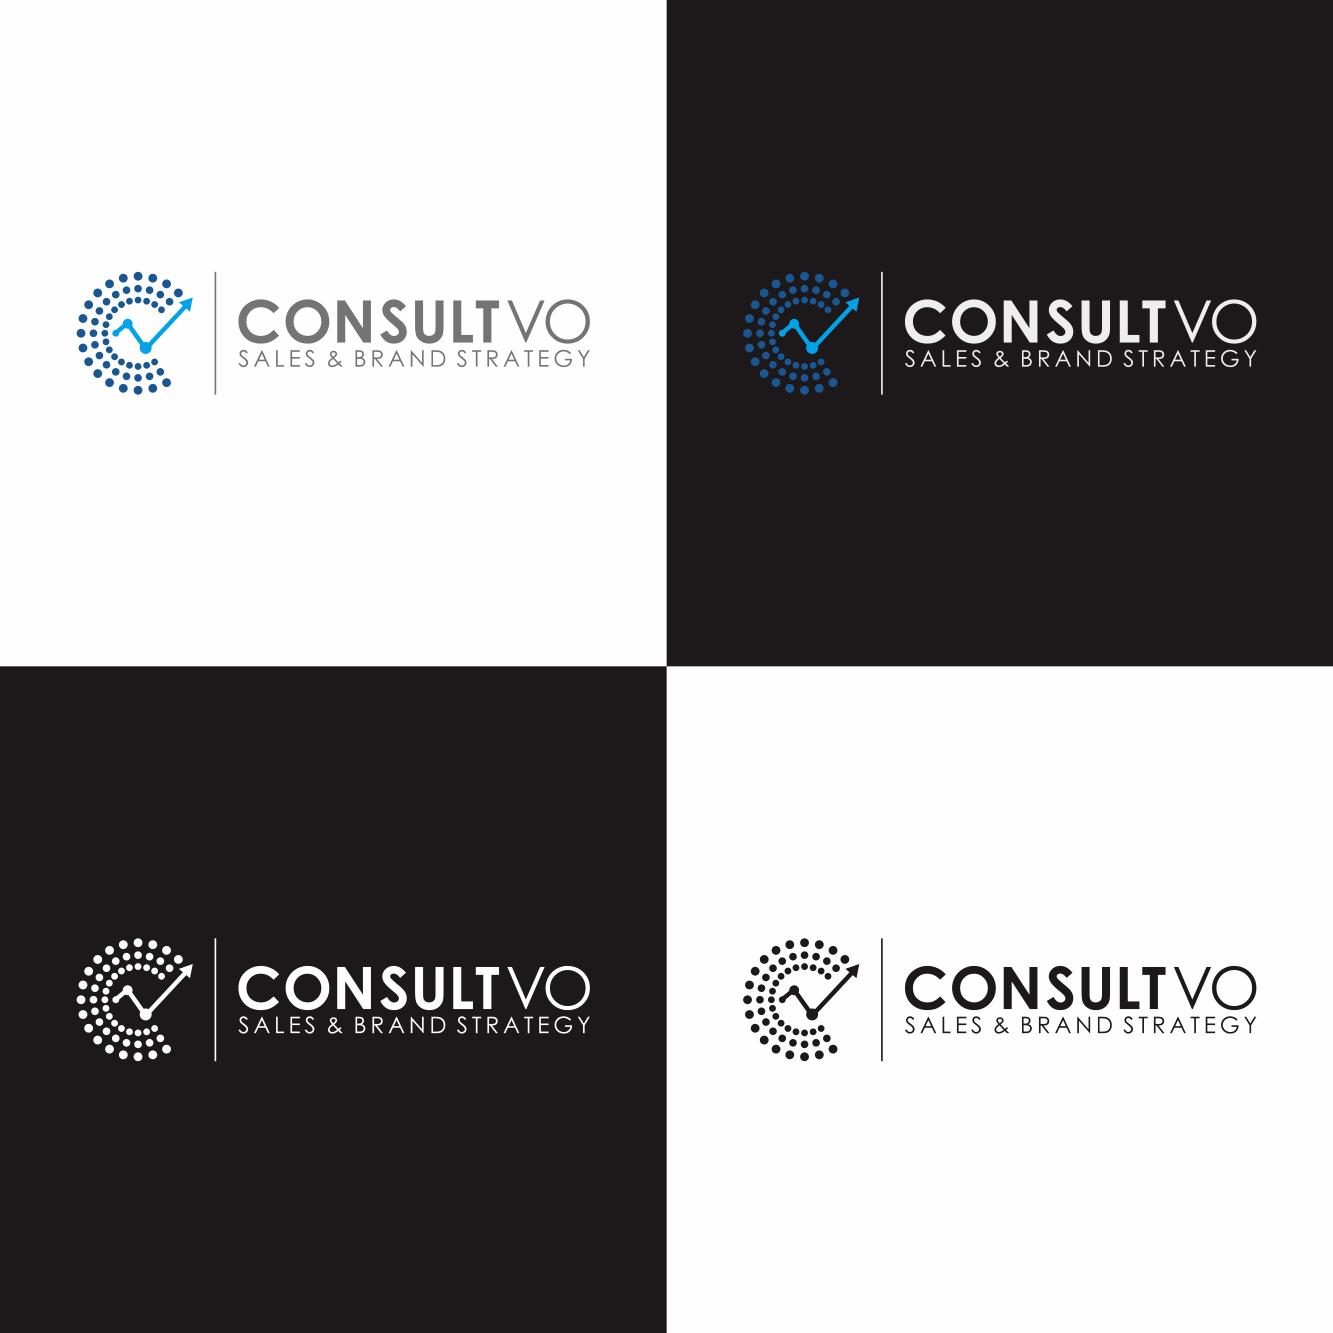 Creative Name and Logo Chalenge!